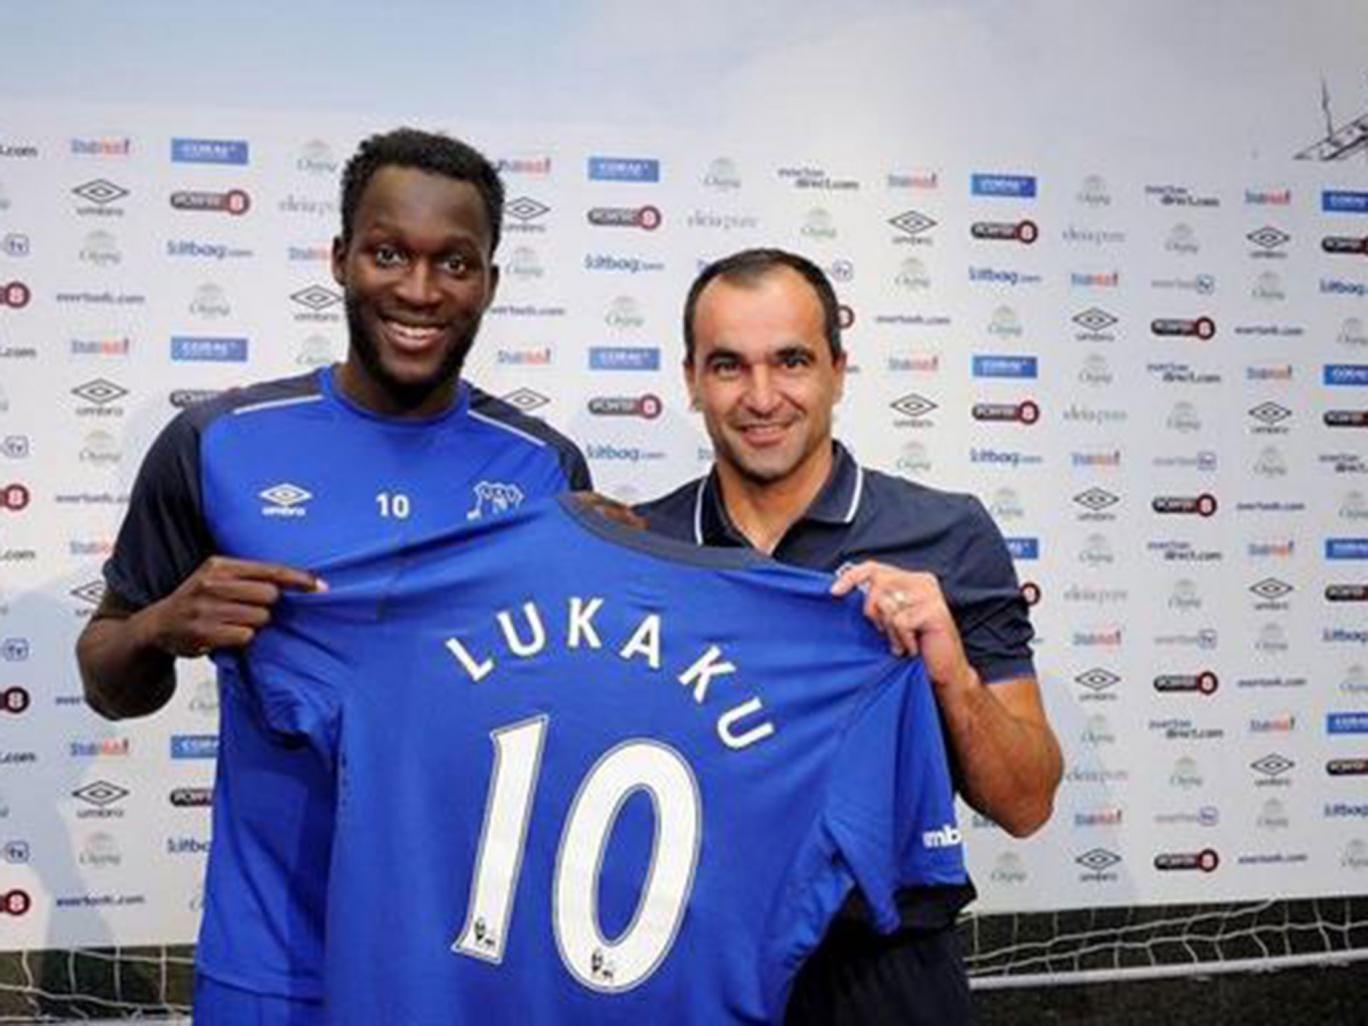 Romelu Lukaku is presented by Roberto Martinez as an Everton player following his £28m move